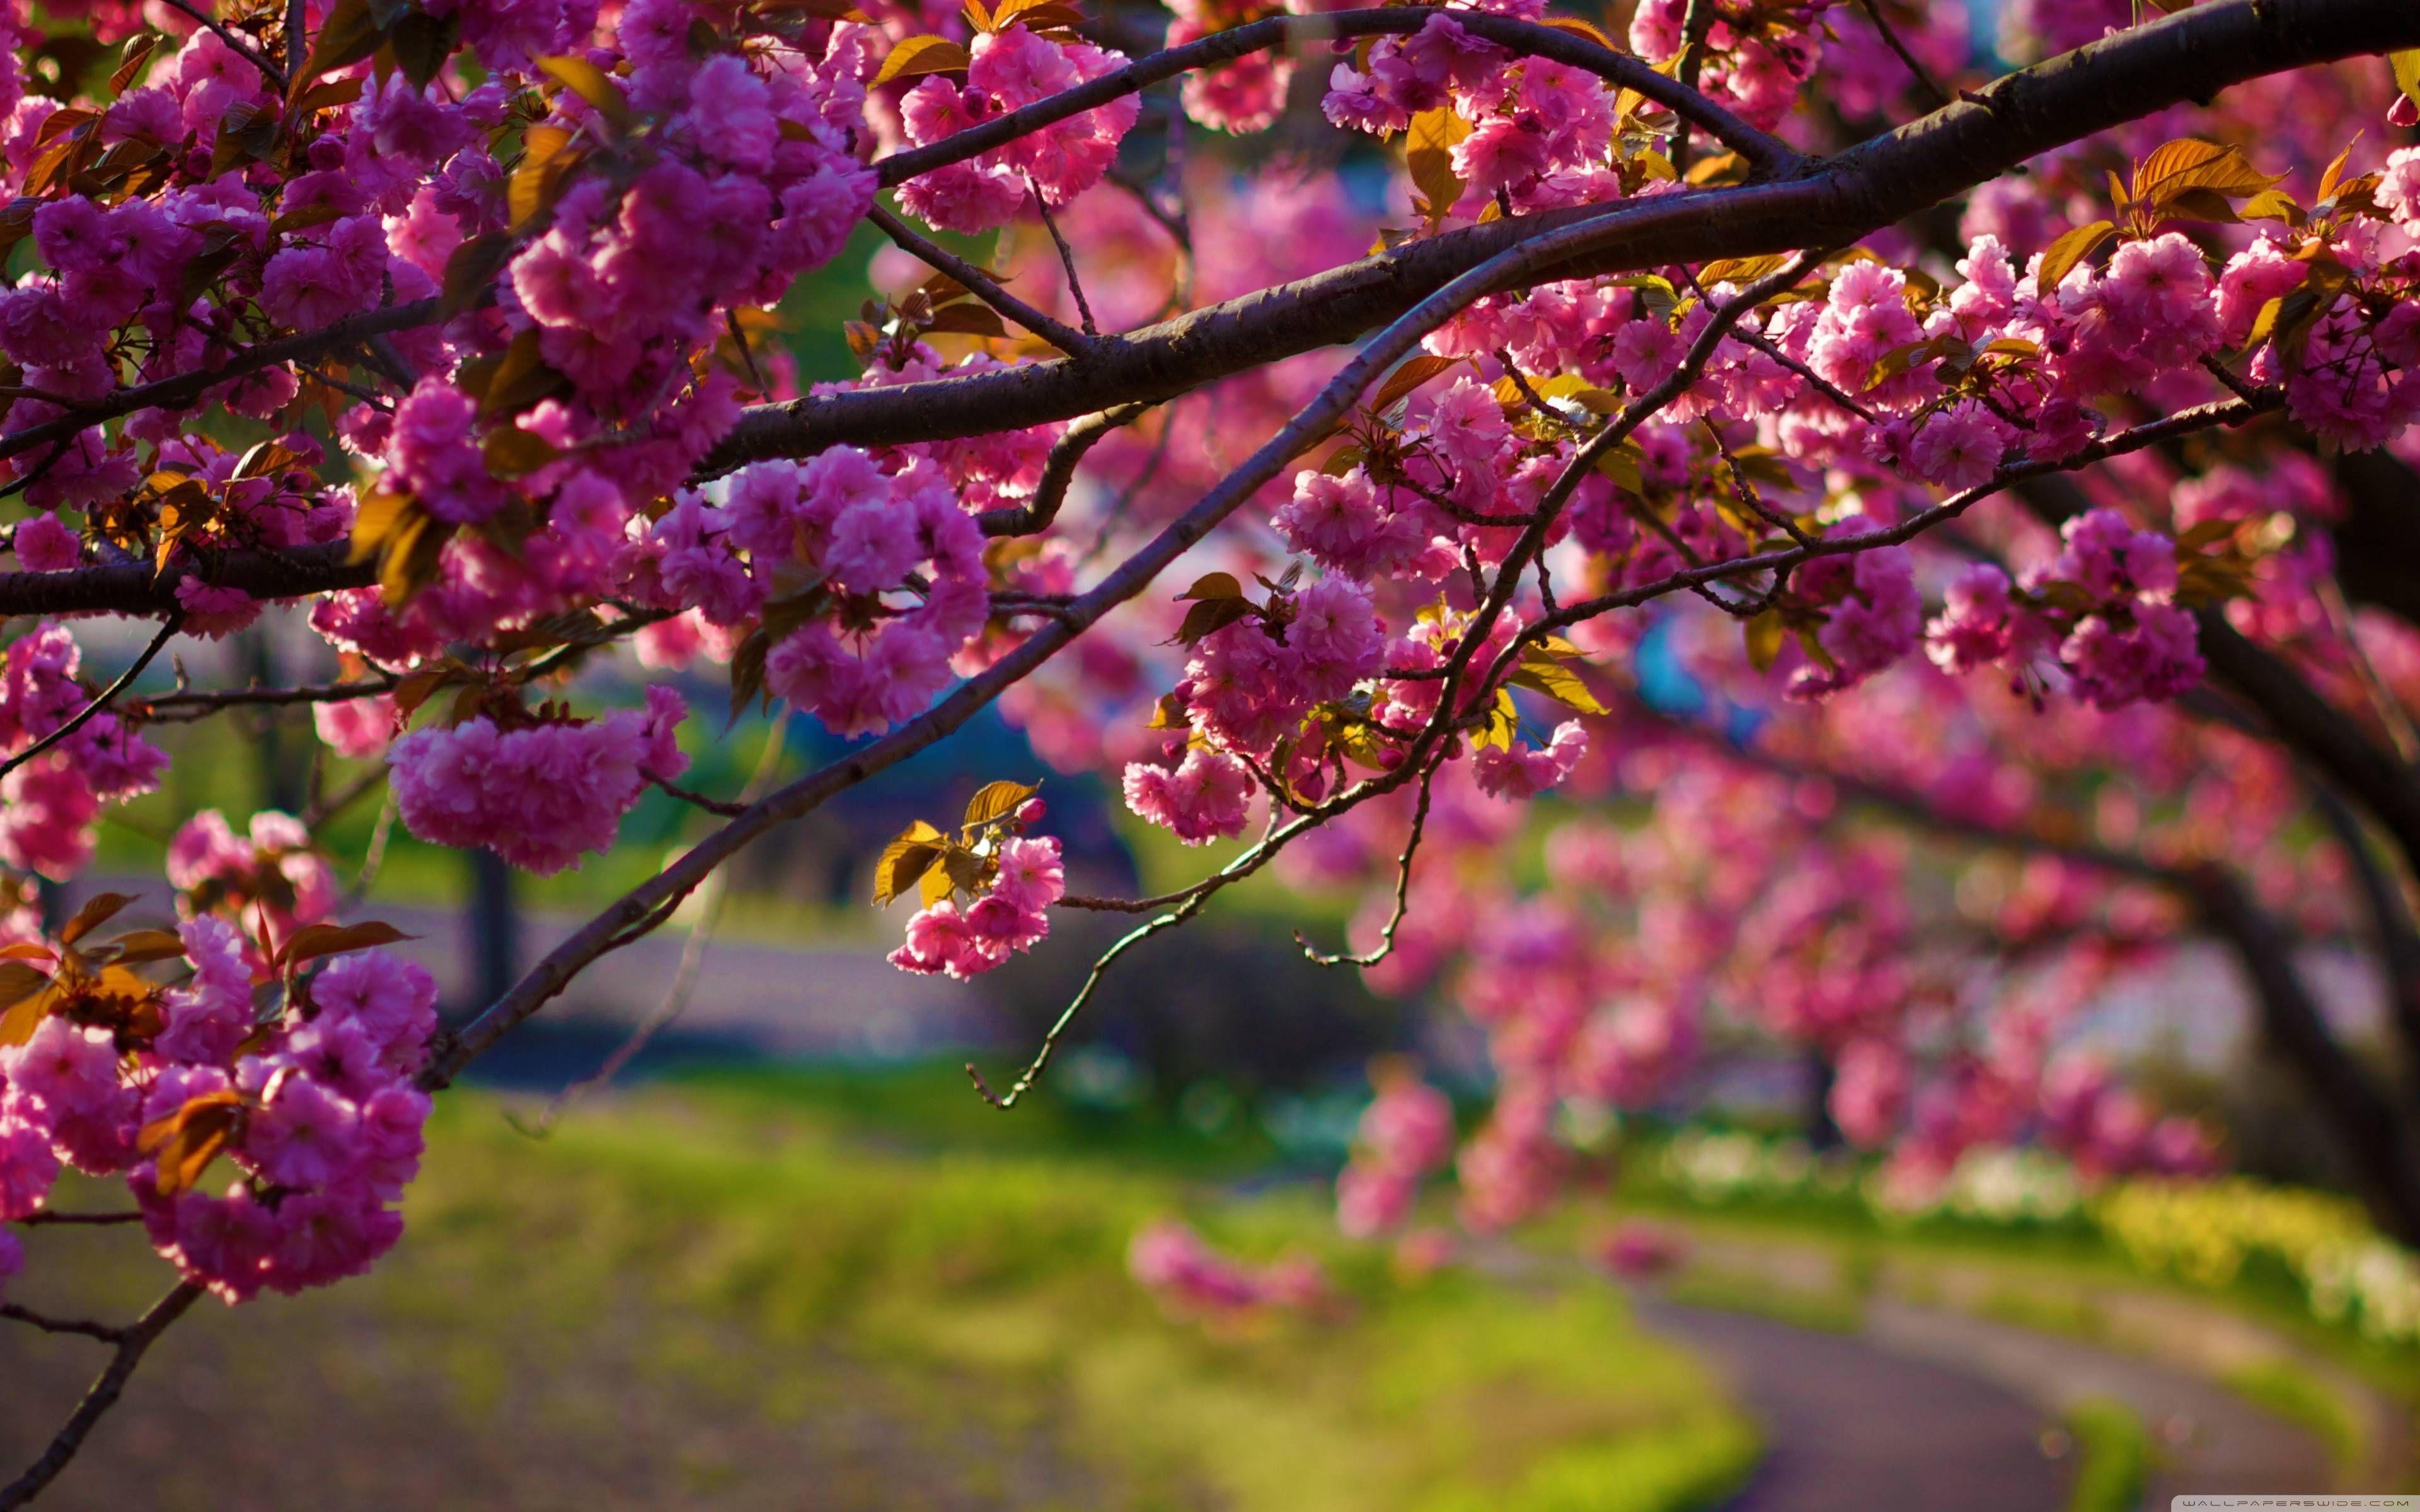 Spring Nature Wallpaper 12801024 Via Classy Bro Spring Wallpaper Spring Wallpaper Hd Spring Desktop Wallpaper